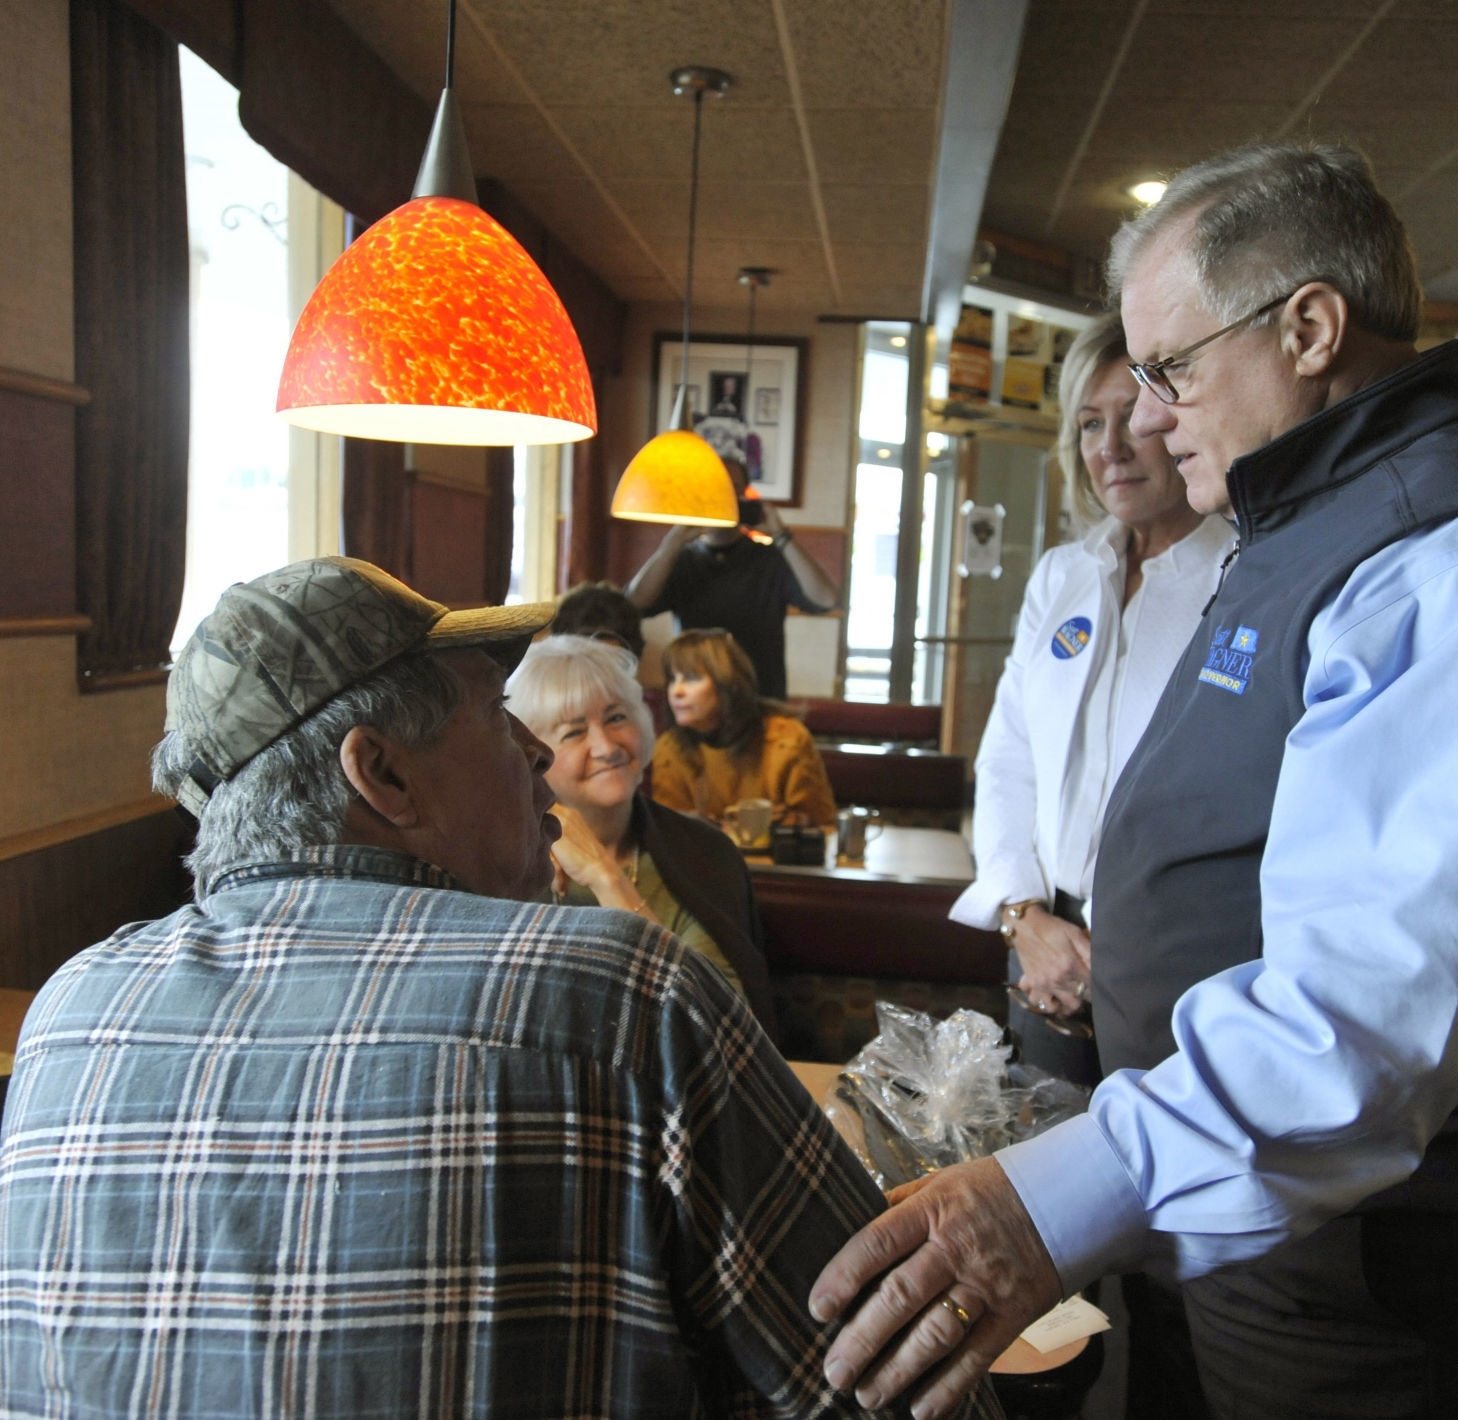 news-voterpreview110618-02 | Philly Tribune